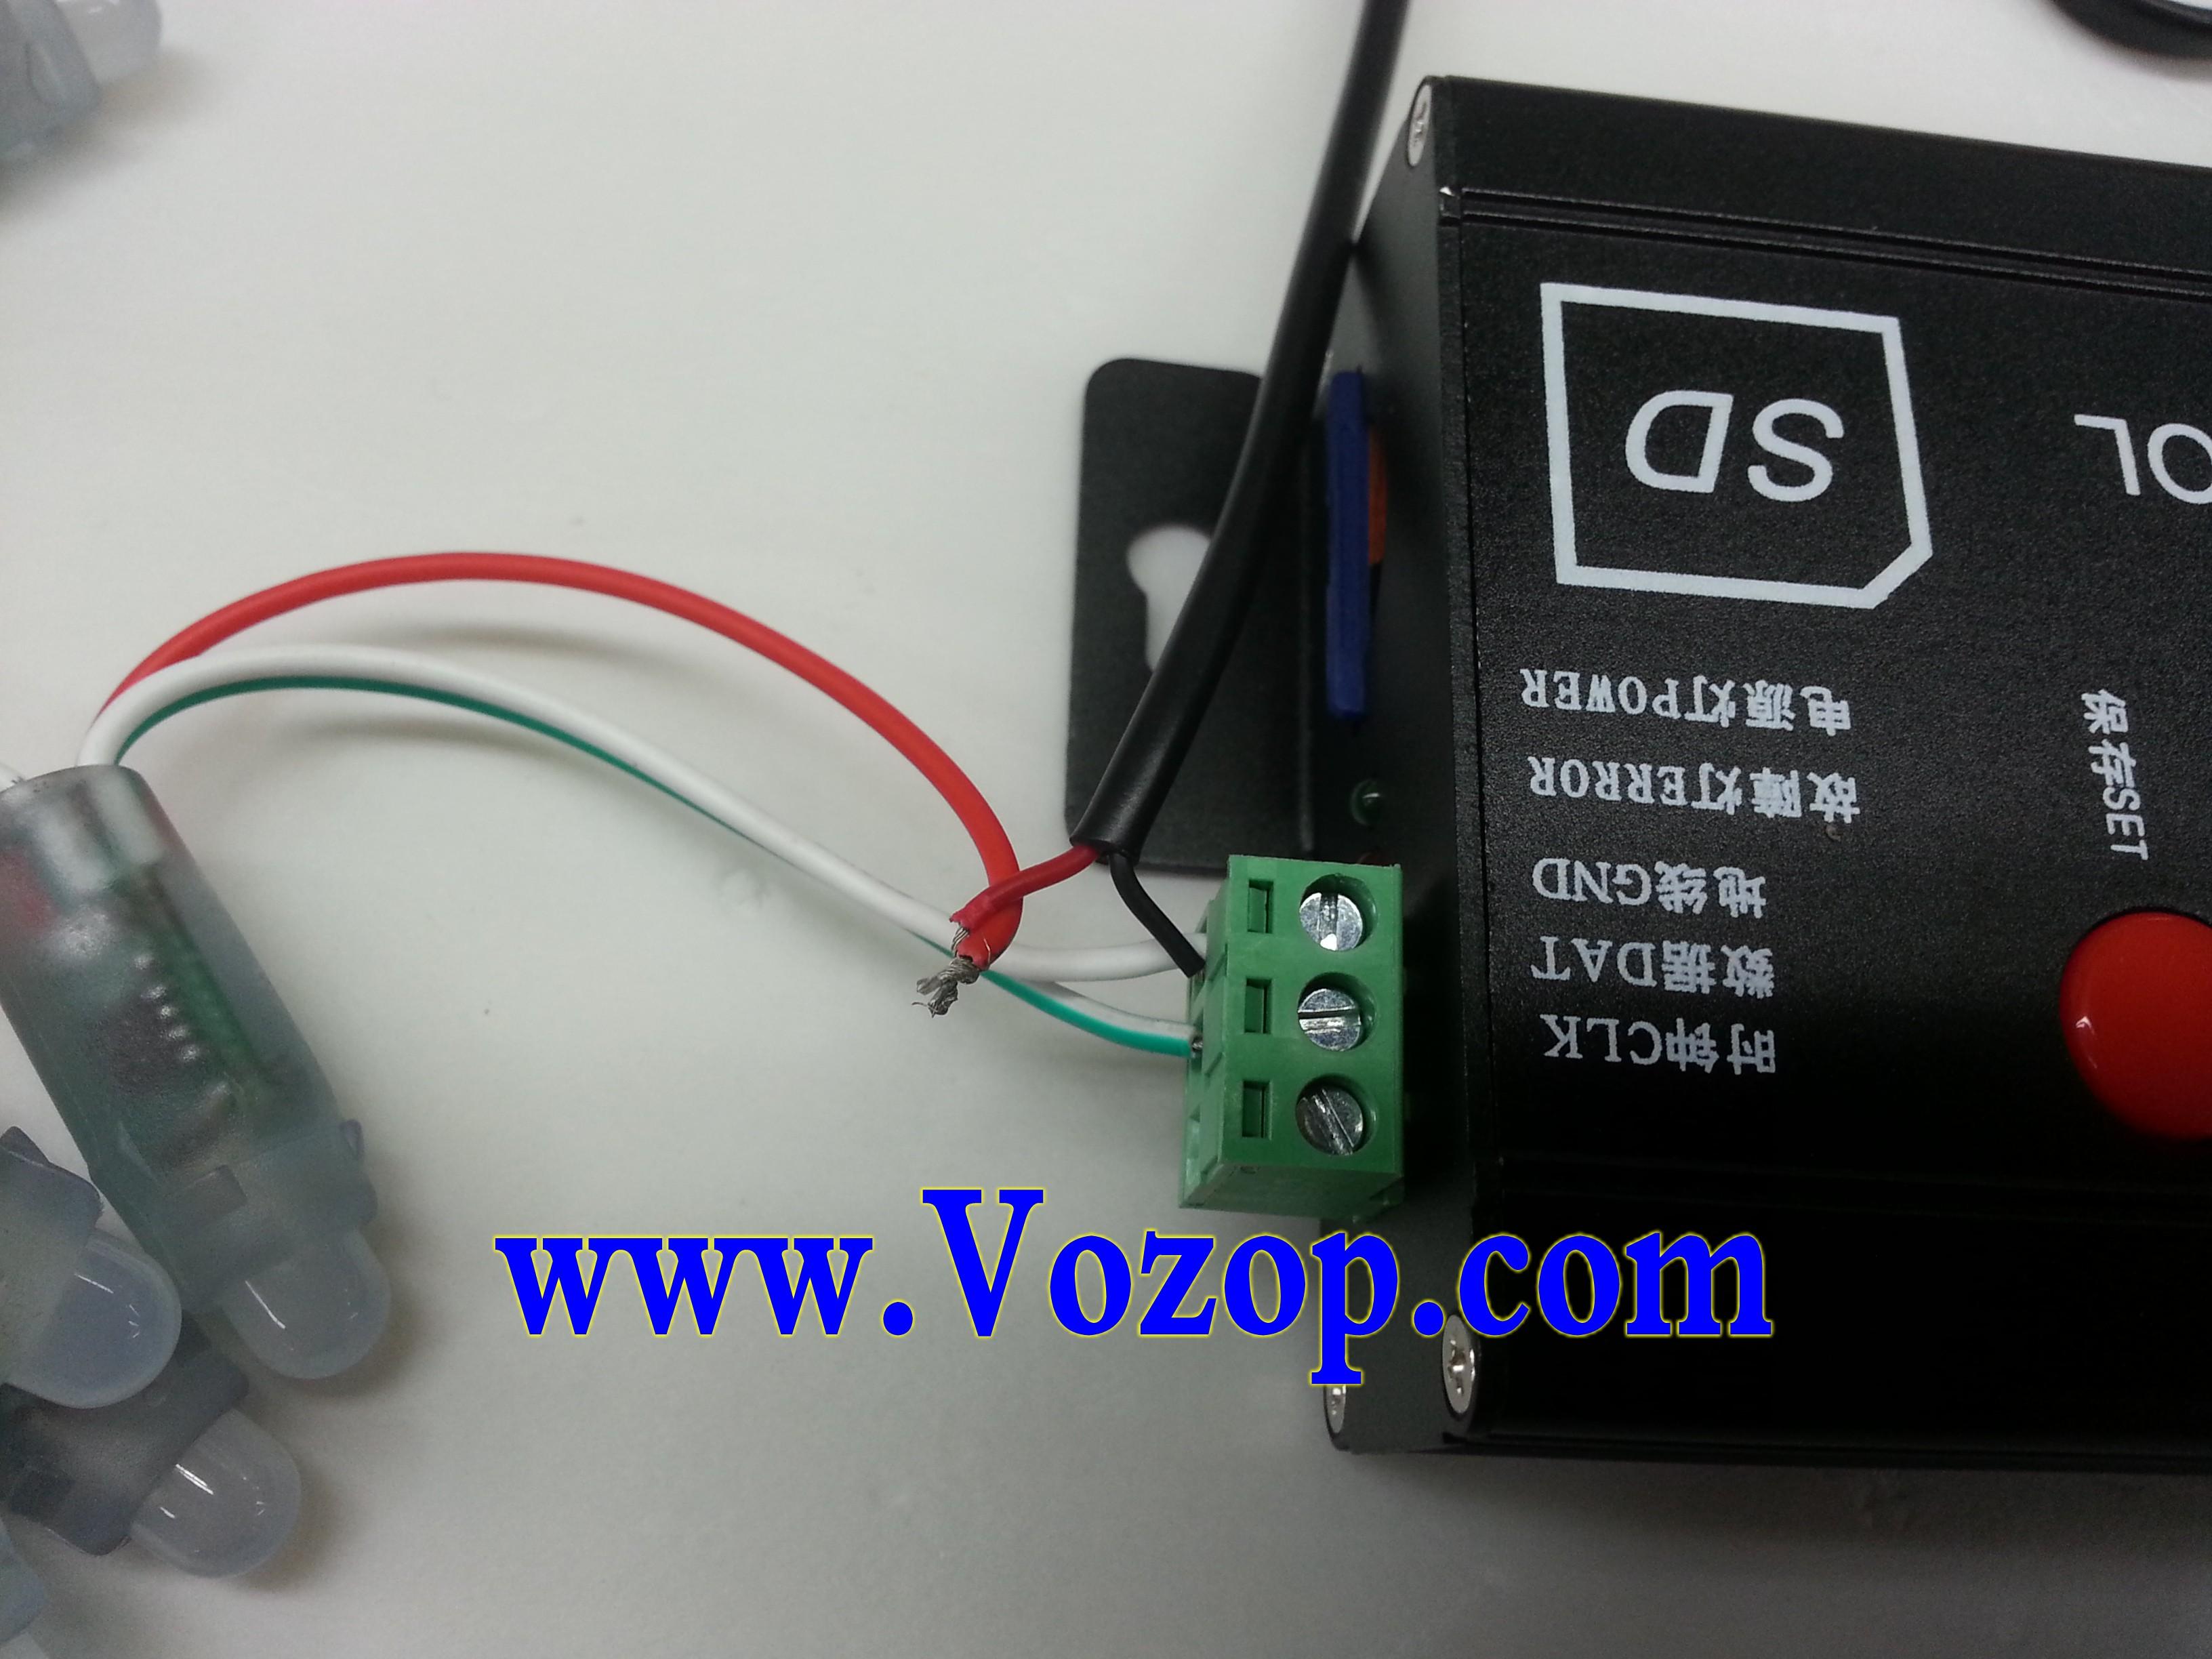 UCS_1903_LED_Module_DC_5V_Waterproof_RGB_LED_Pixel_Module_connection_project_1